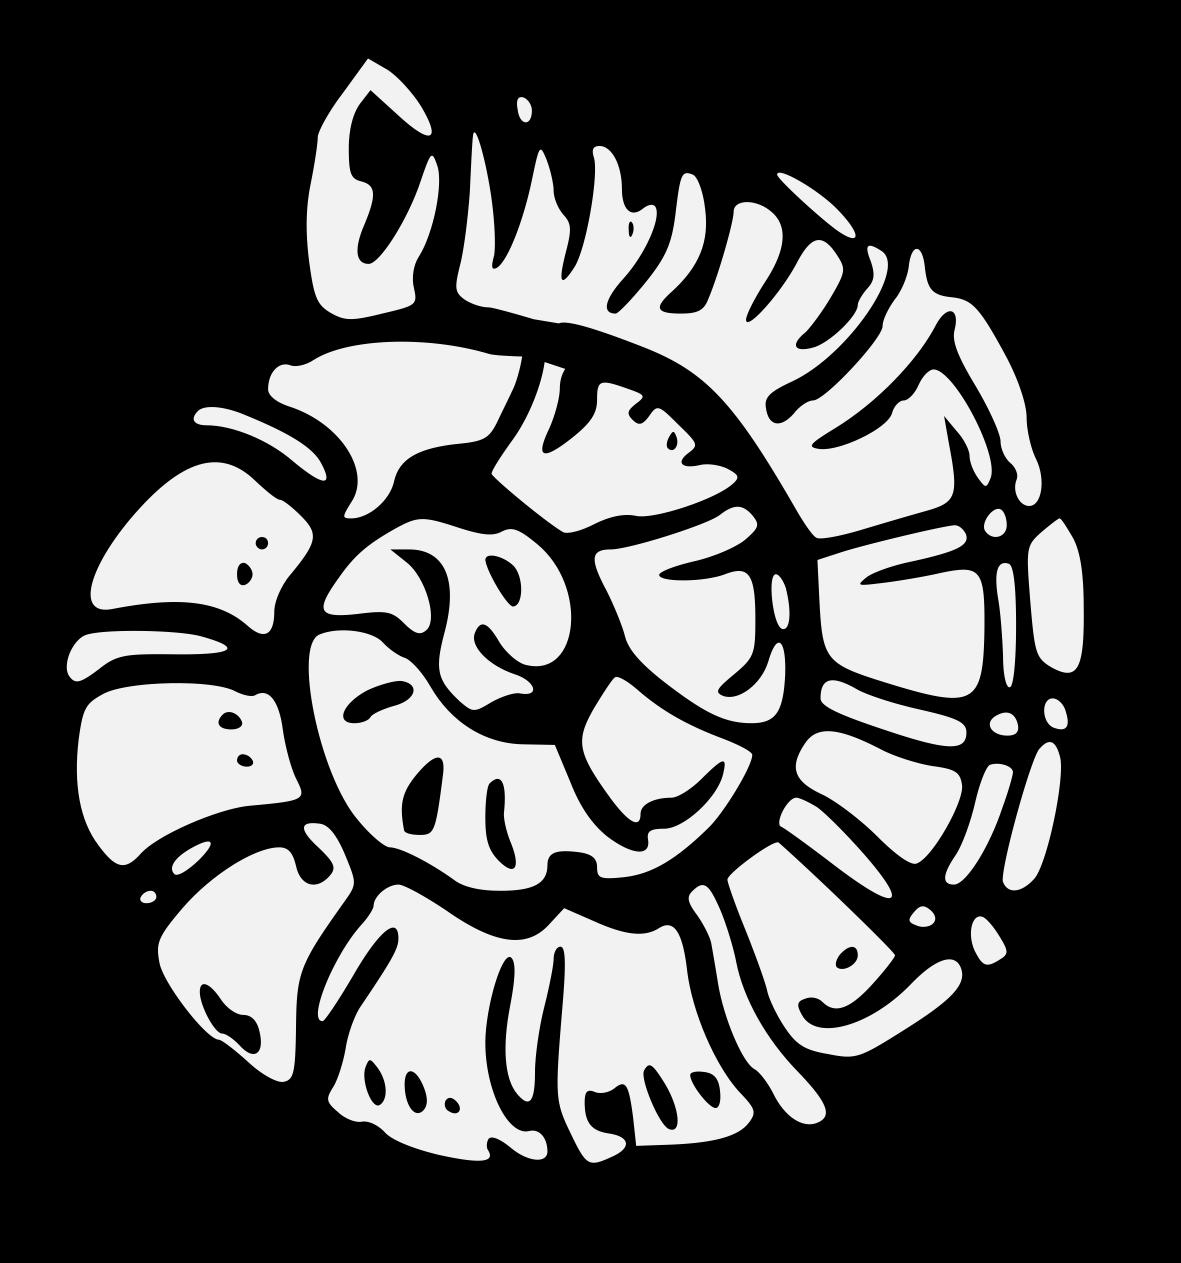 Shell clipart heraldic scallop. Traceable art pdf